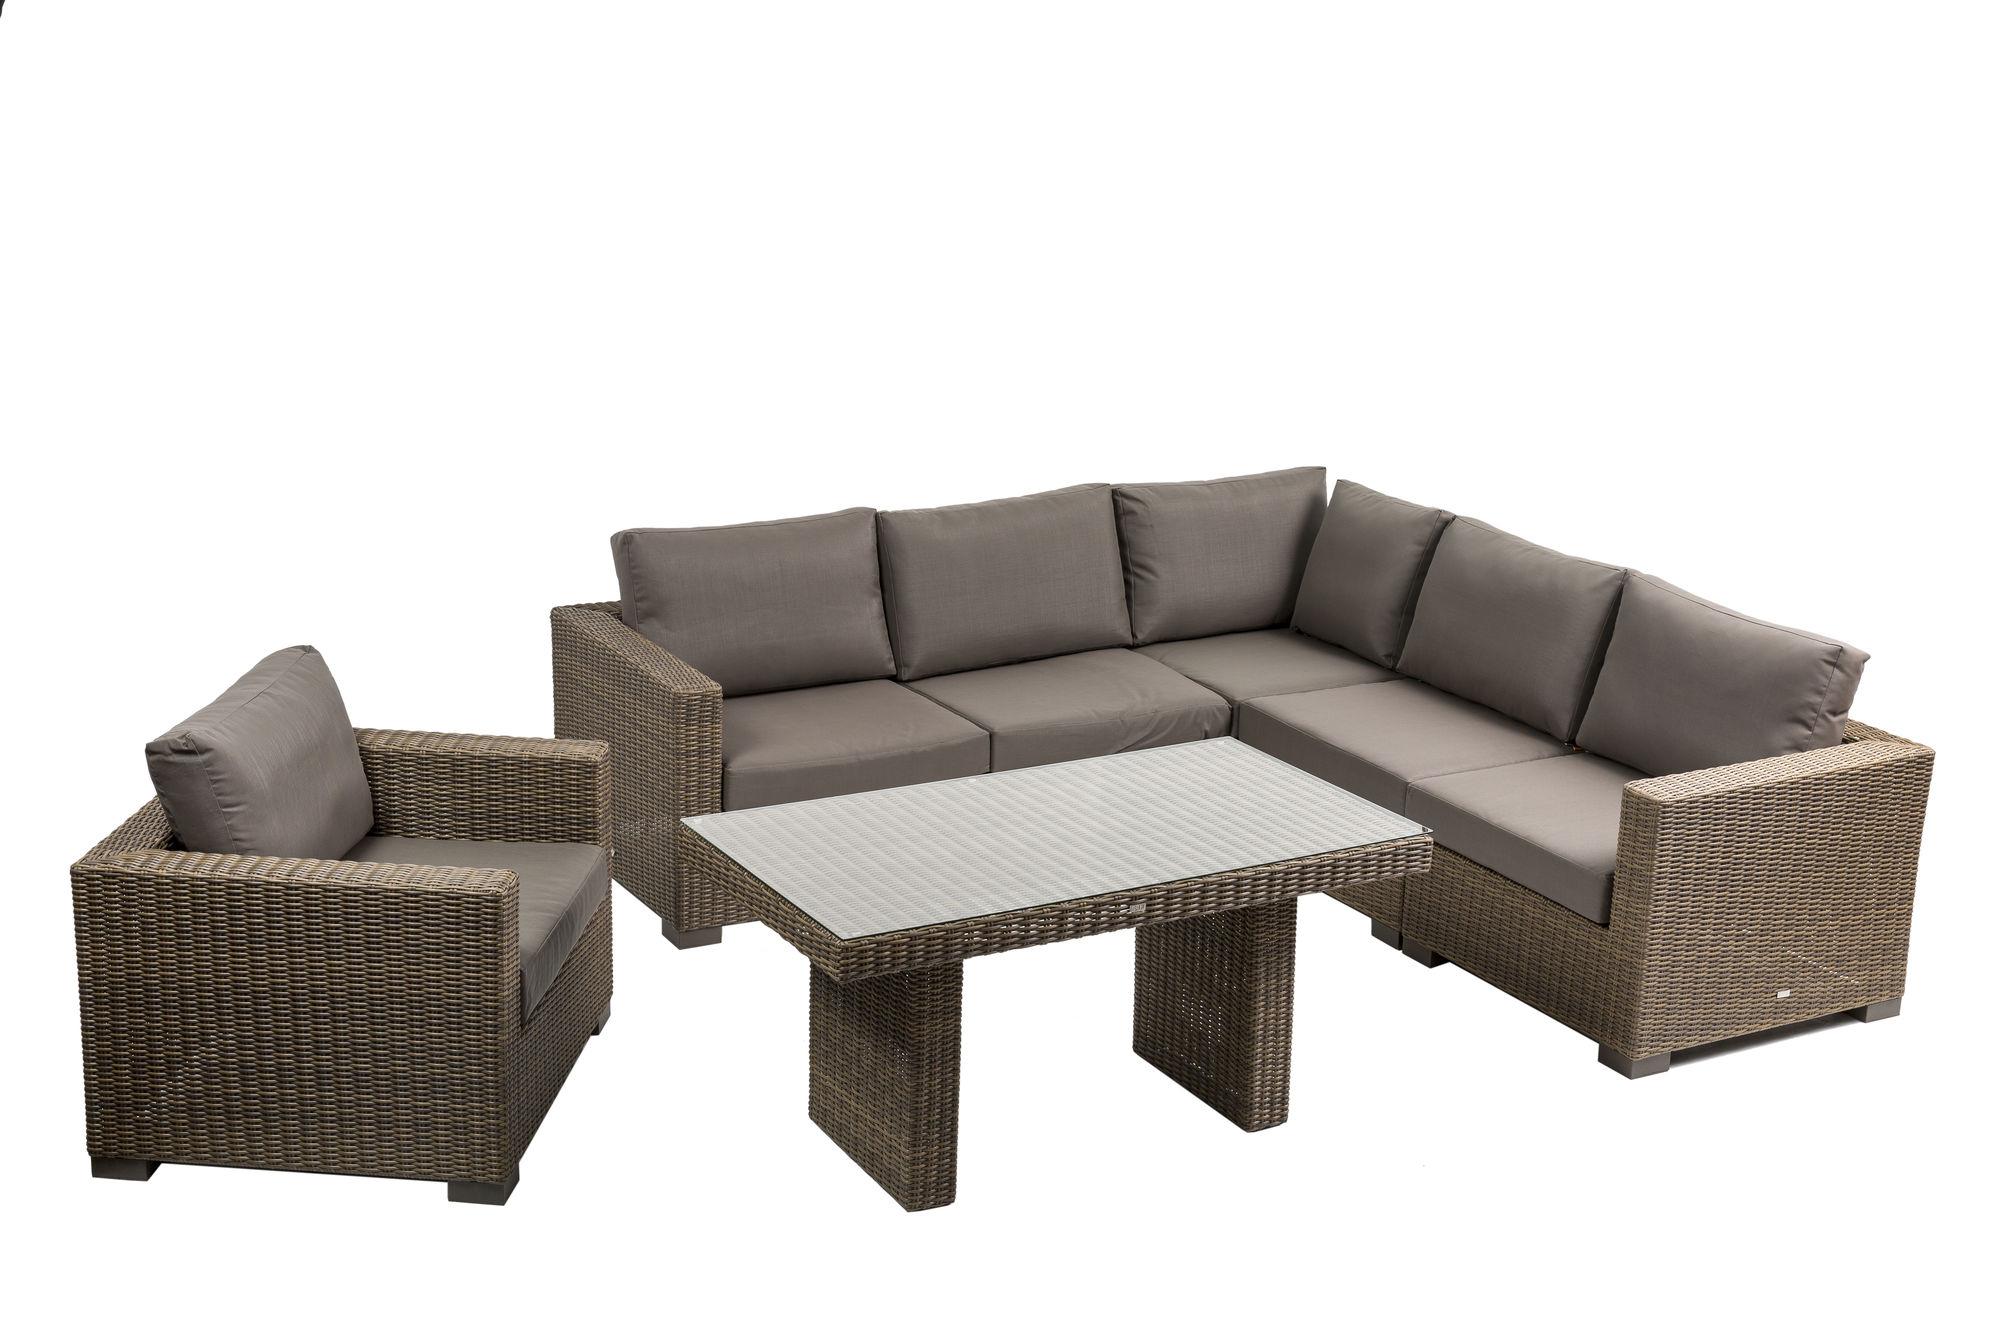 Sofas Tarragona E6d5 Tarragona Luxury Weave Light Brown Resin sofa Suite Avant Garden Uk